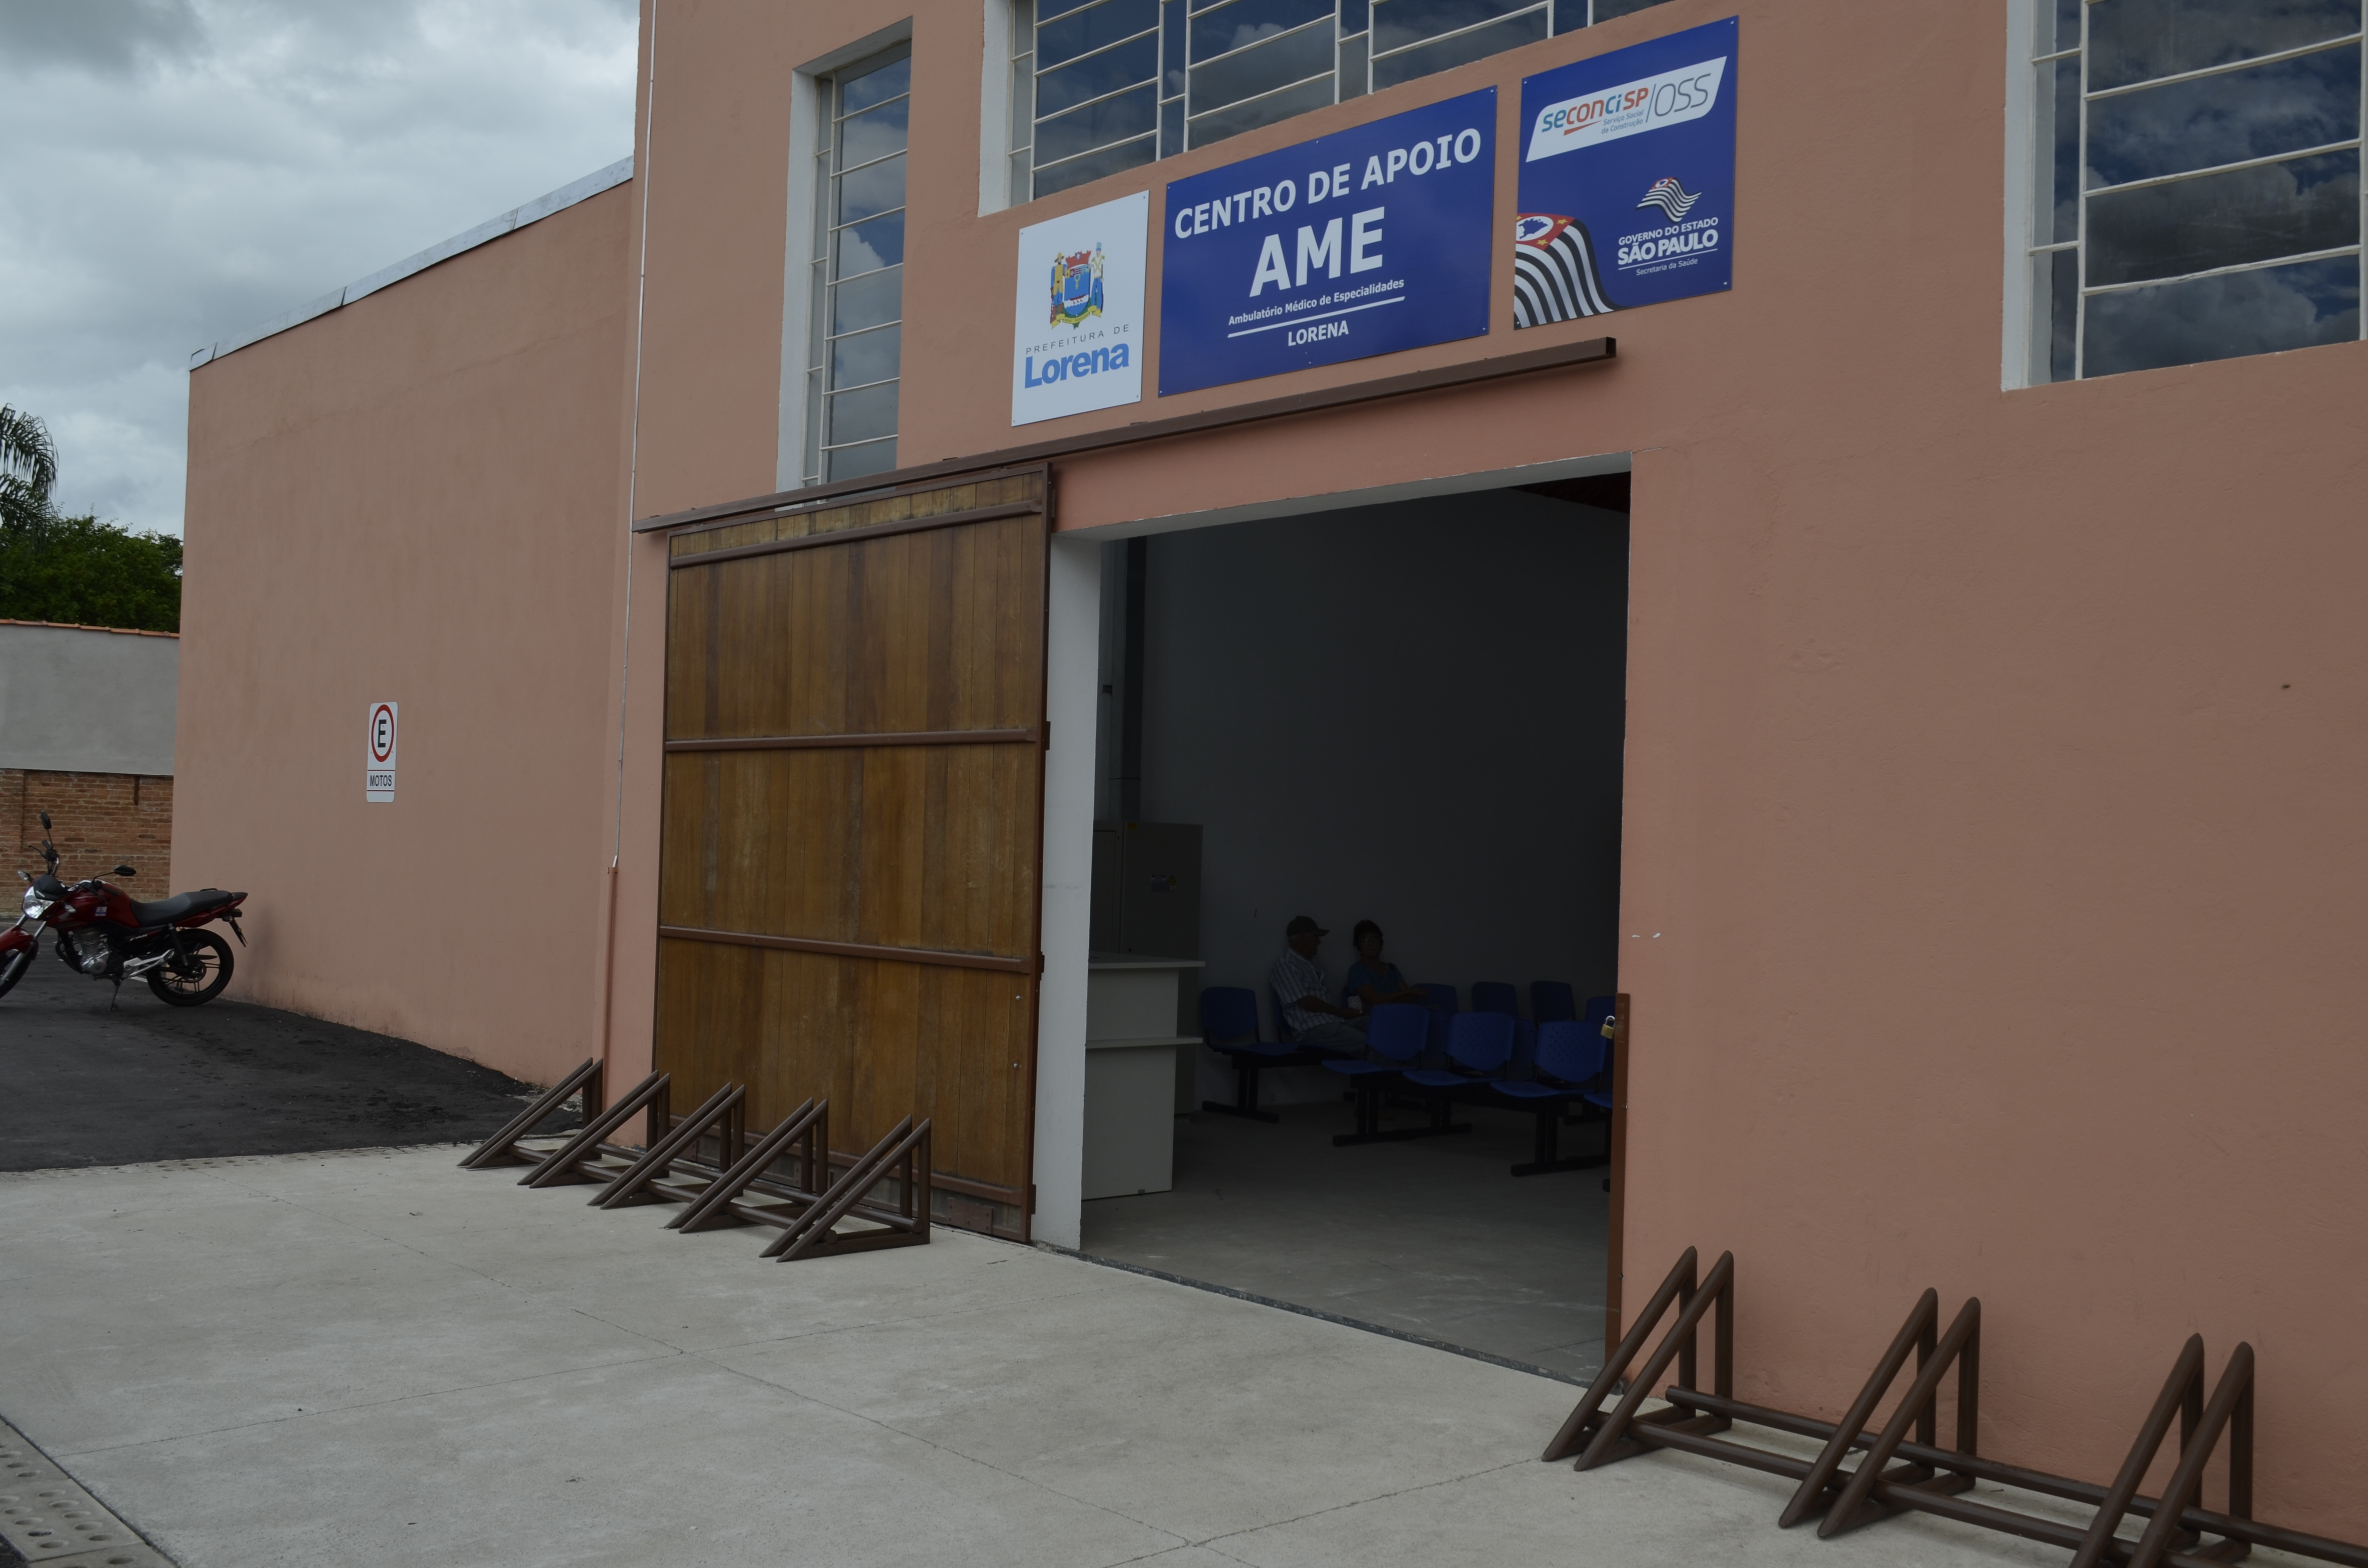 Área do Mercado Municipal disponibilizada para o Centro de Apoio ao AME (Foto: Estéfani Braz)